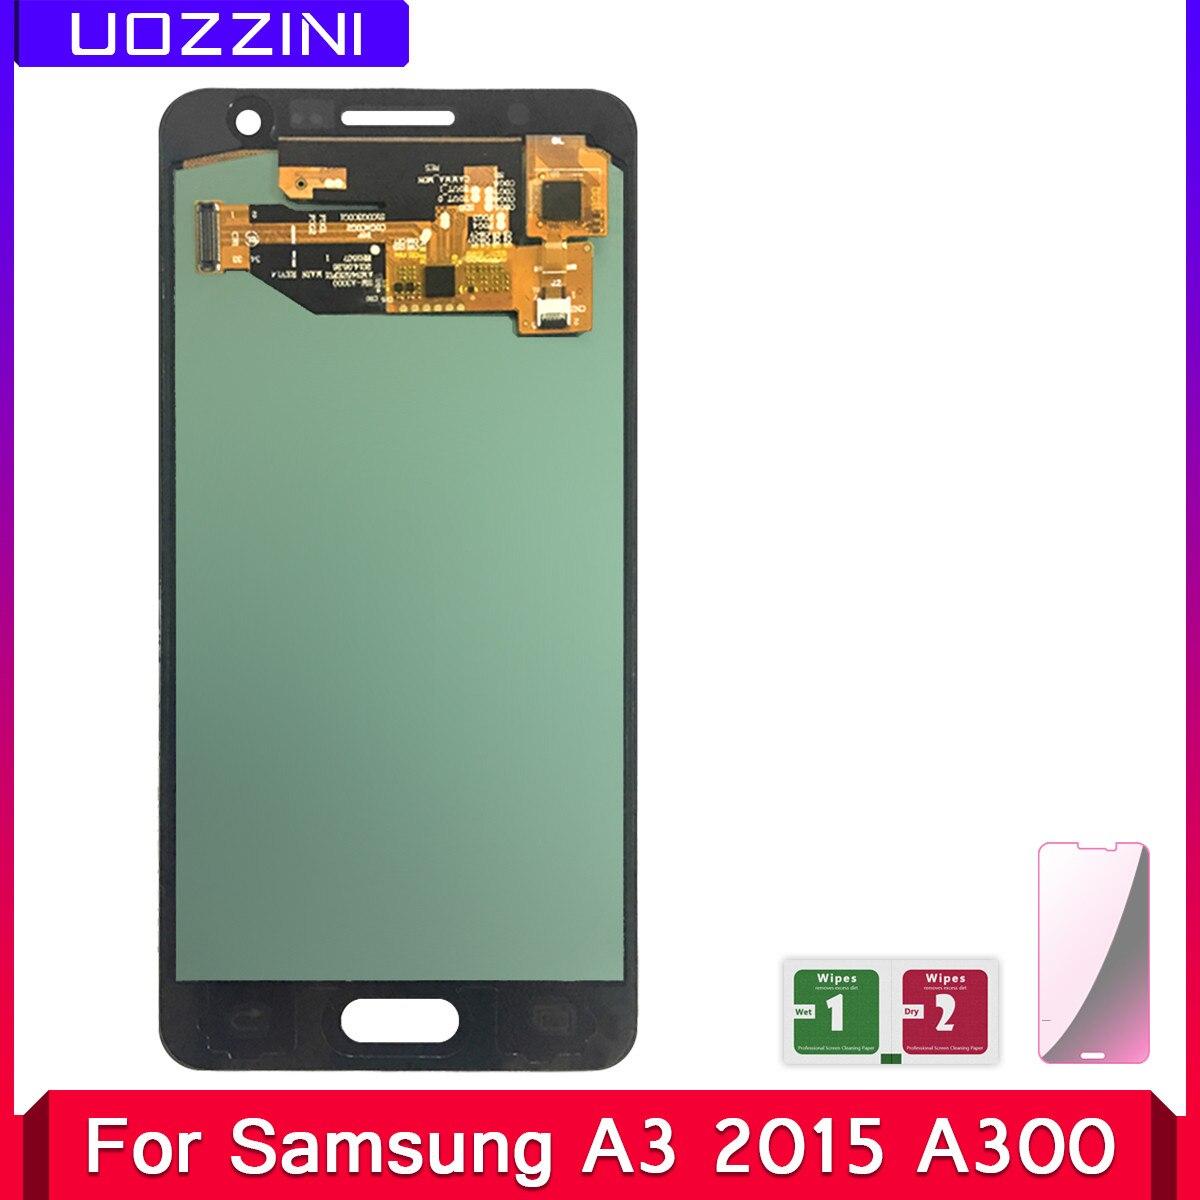 Pantalla LCD A3 Super Amoled para Samsung Galaxy A3, 2015, A300, A3000, montaje de pantalla táctil, 2 uds.